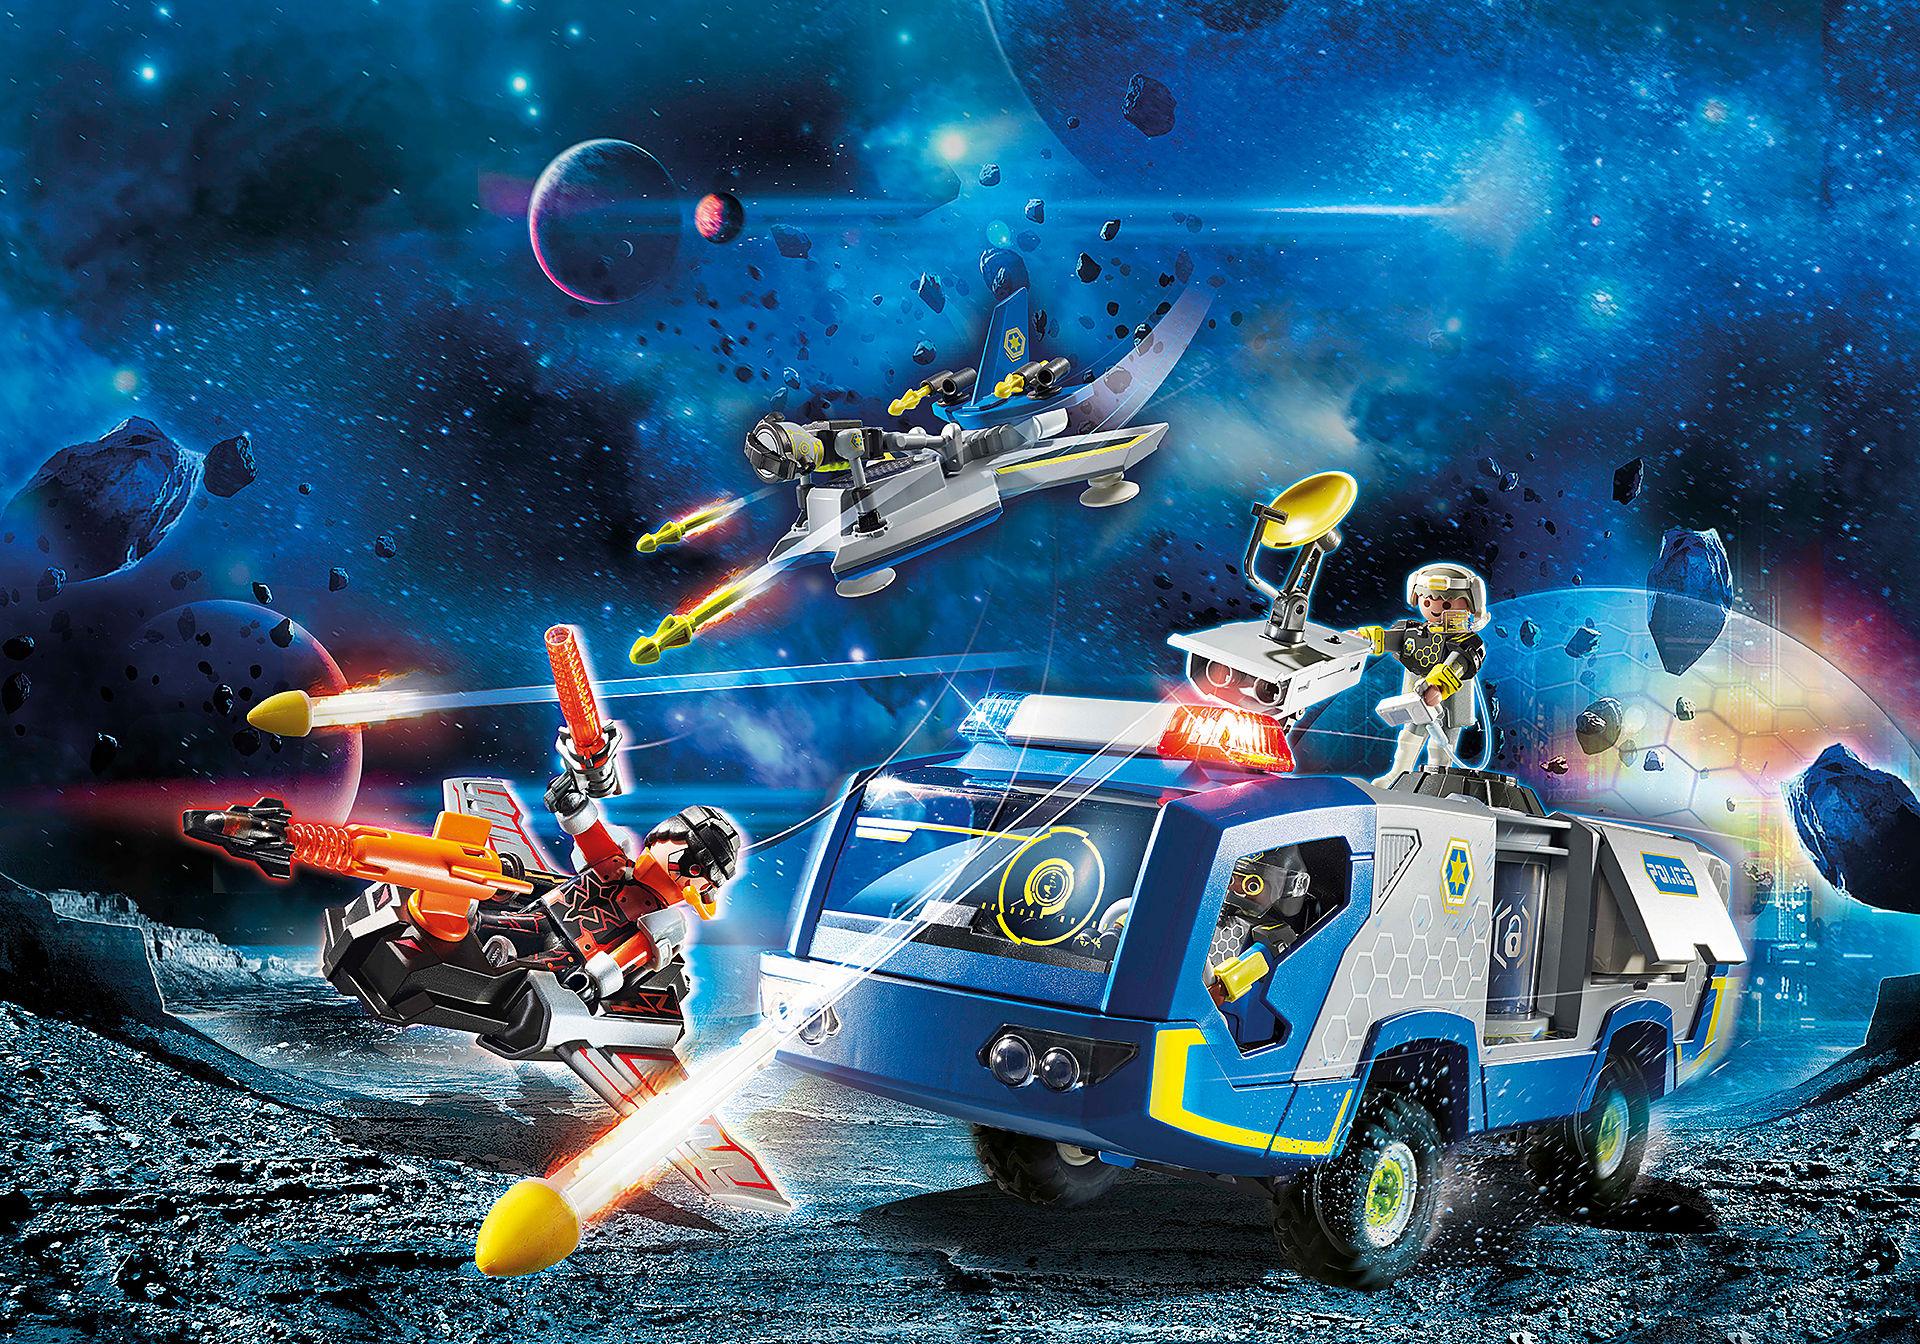 70018 Véhicule des policiers de l'espace  zoom image1